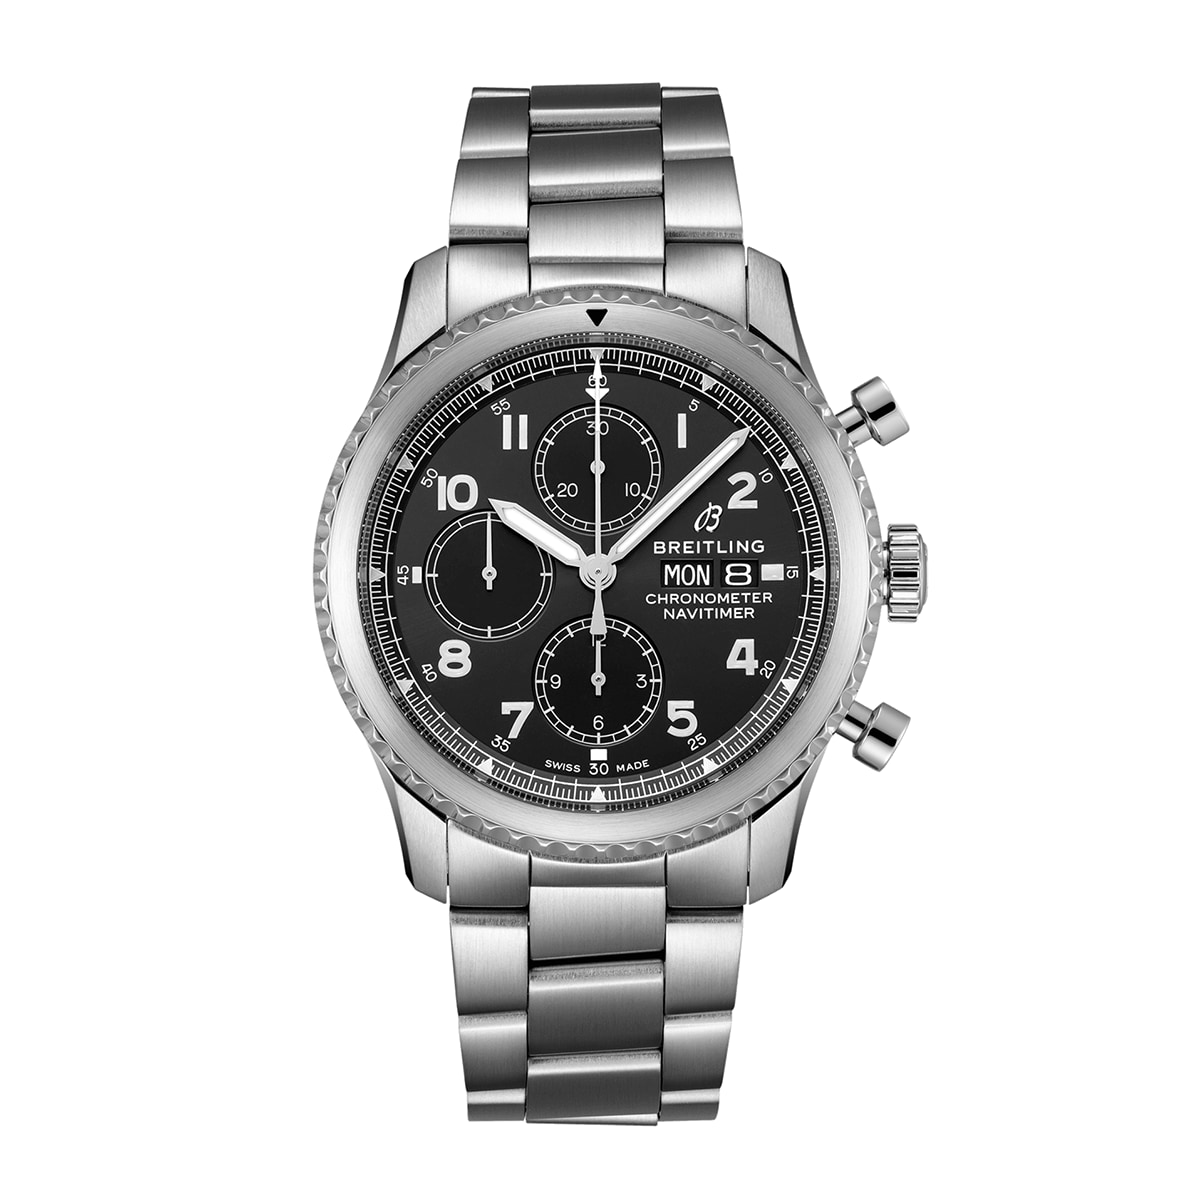 Breitling_navitimer-8-chronograph-43-a13314101b1a1-soldier_hos_Jarl_Sandin